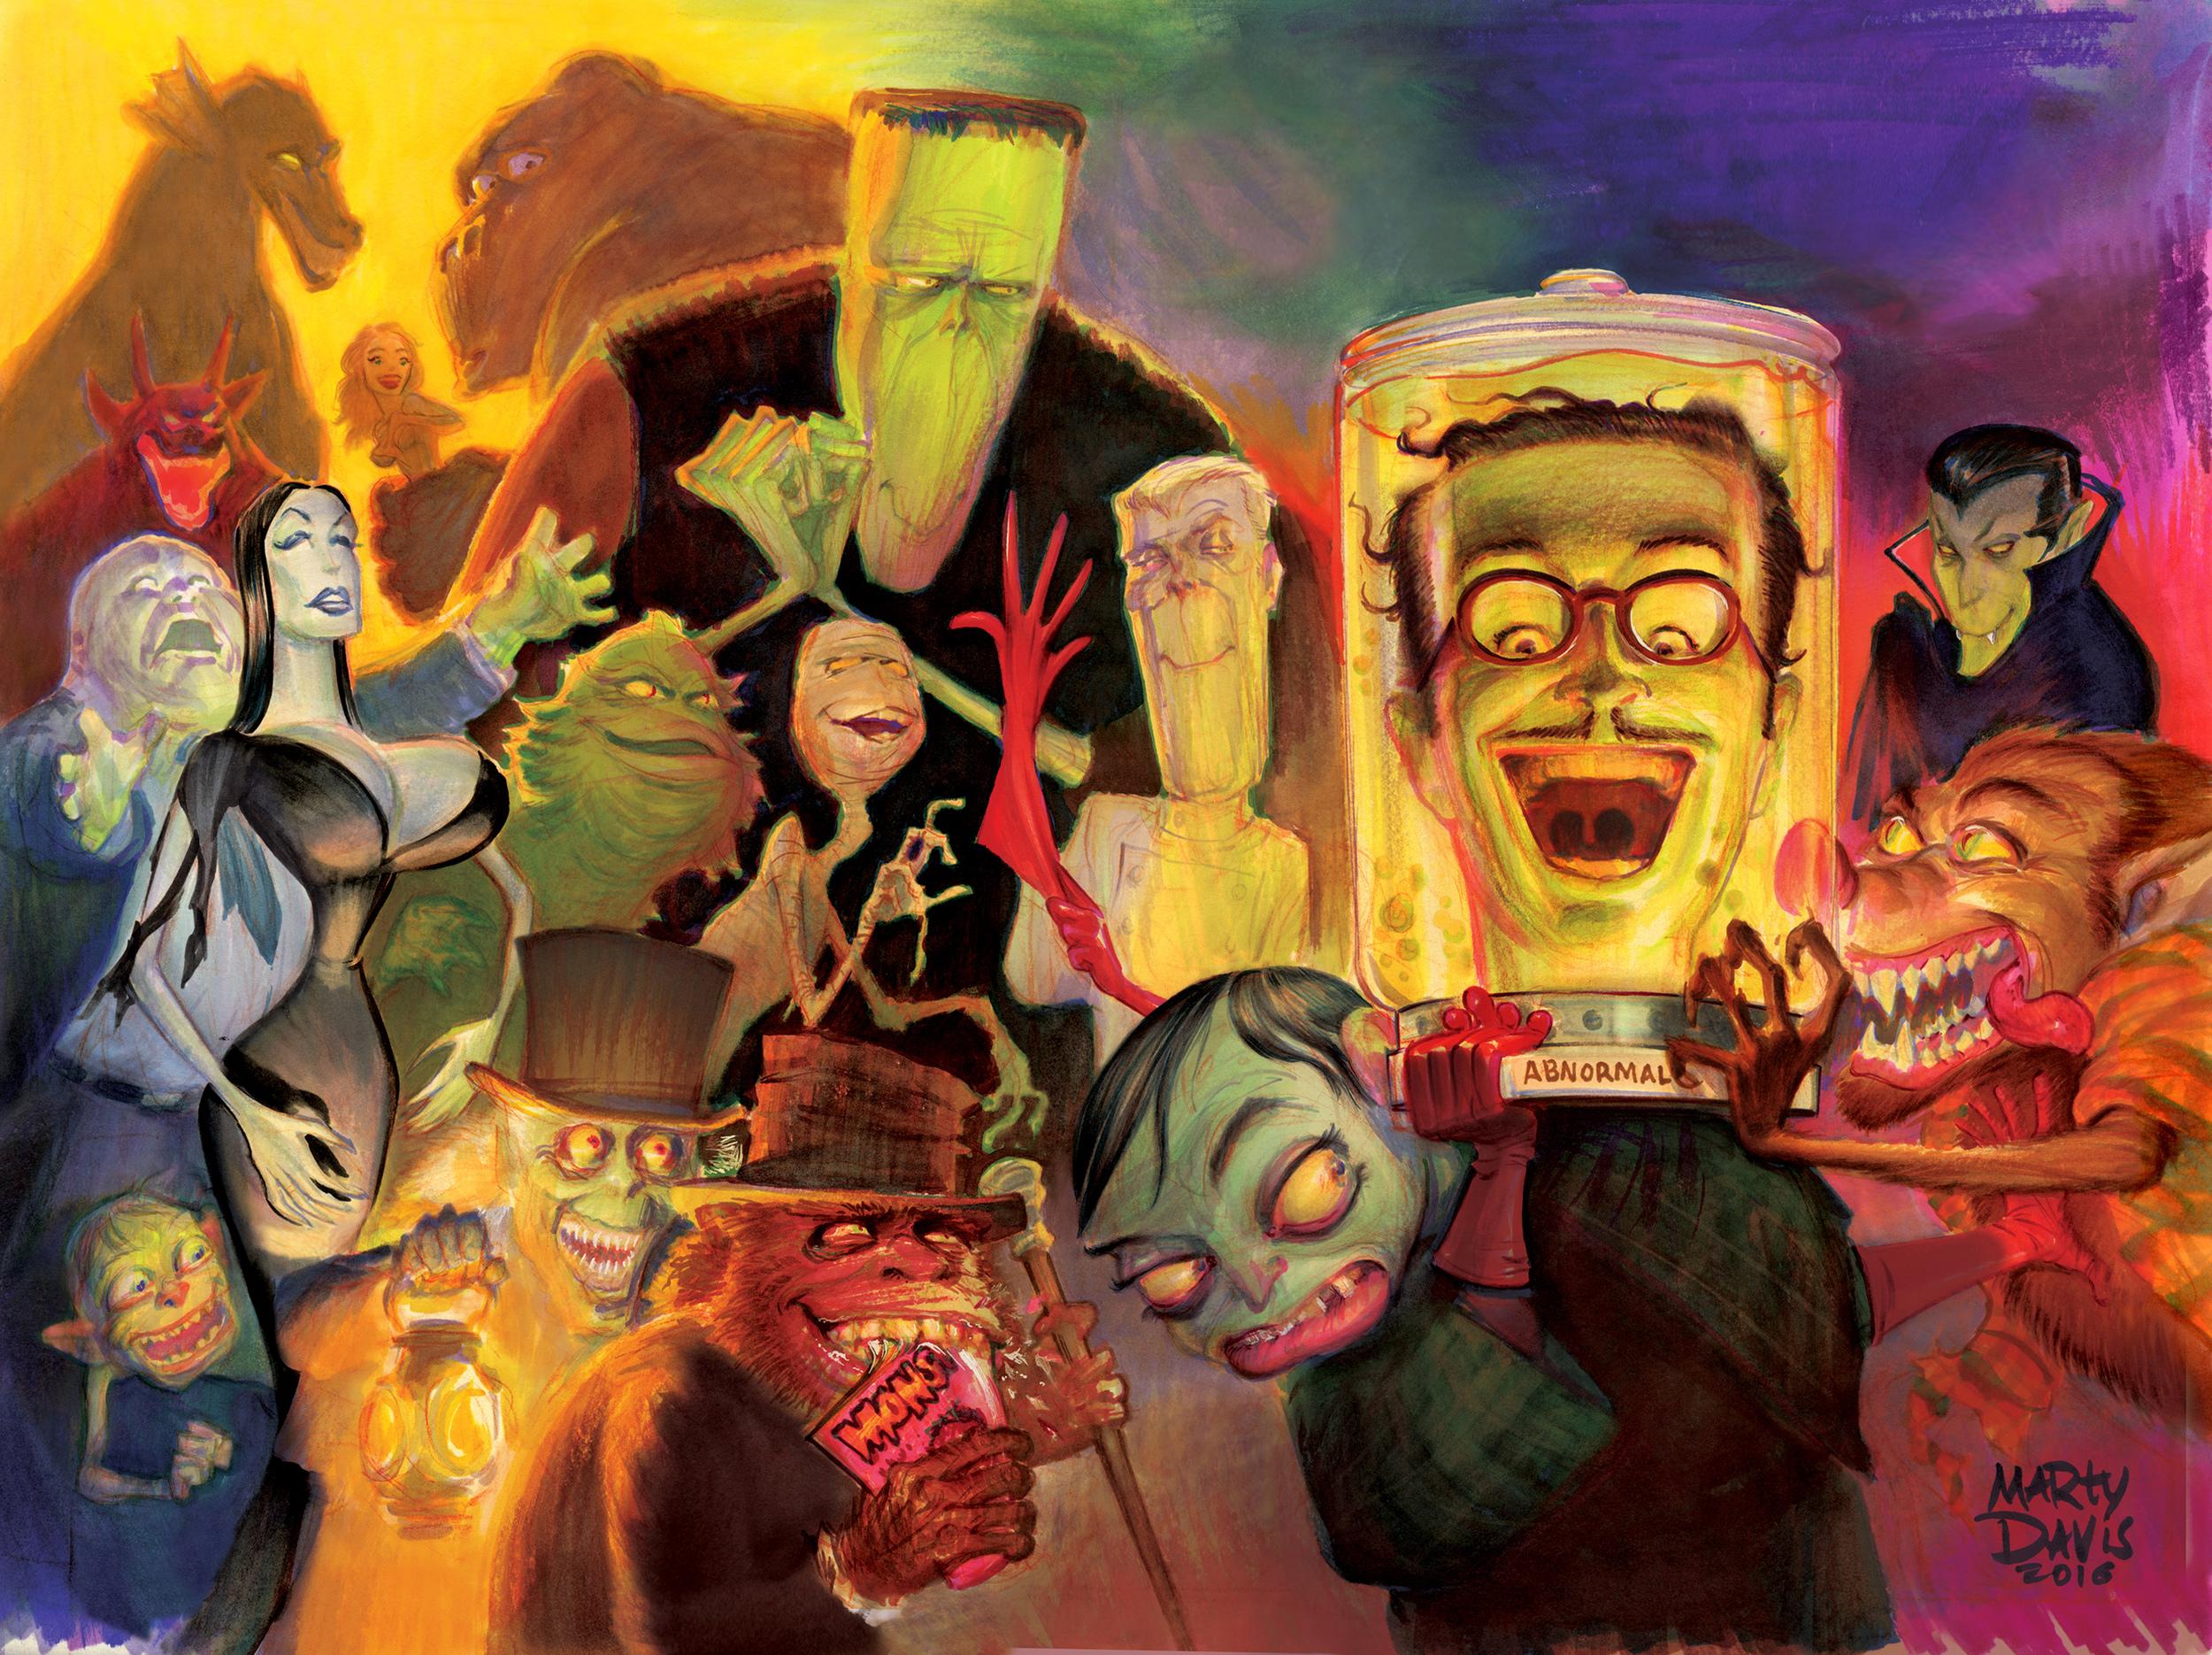 San Diego Comic Fest 2016 Program Cover